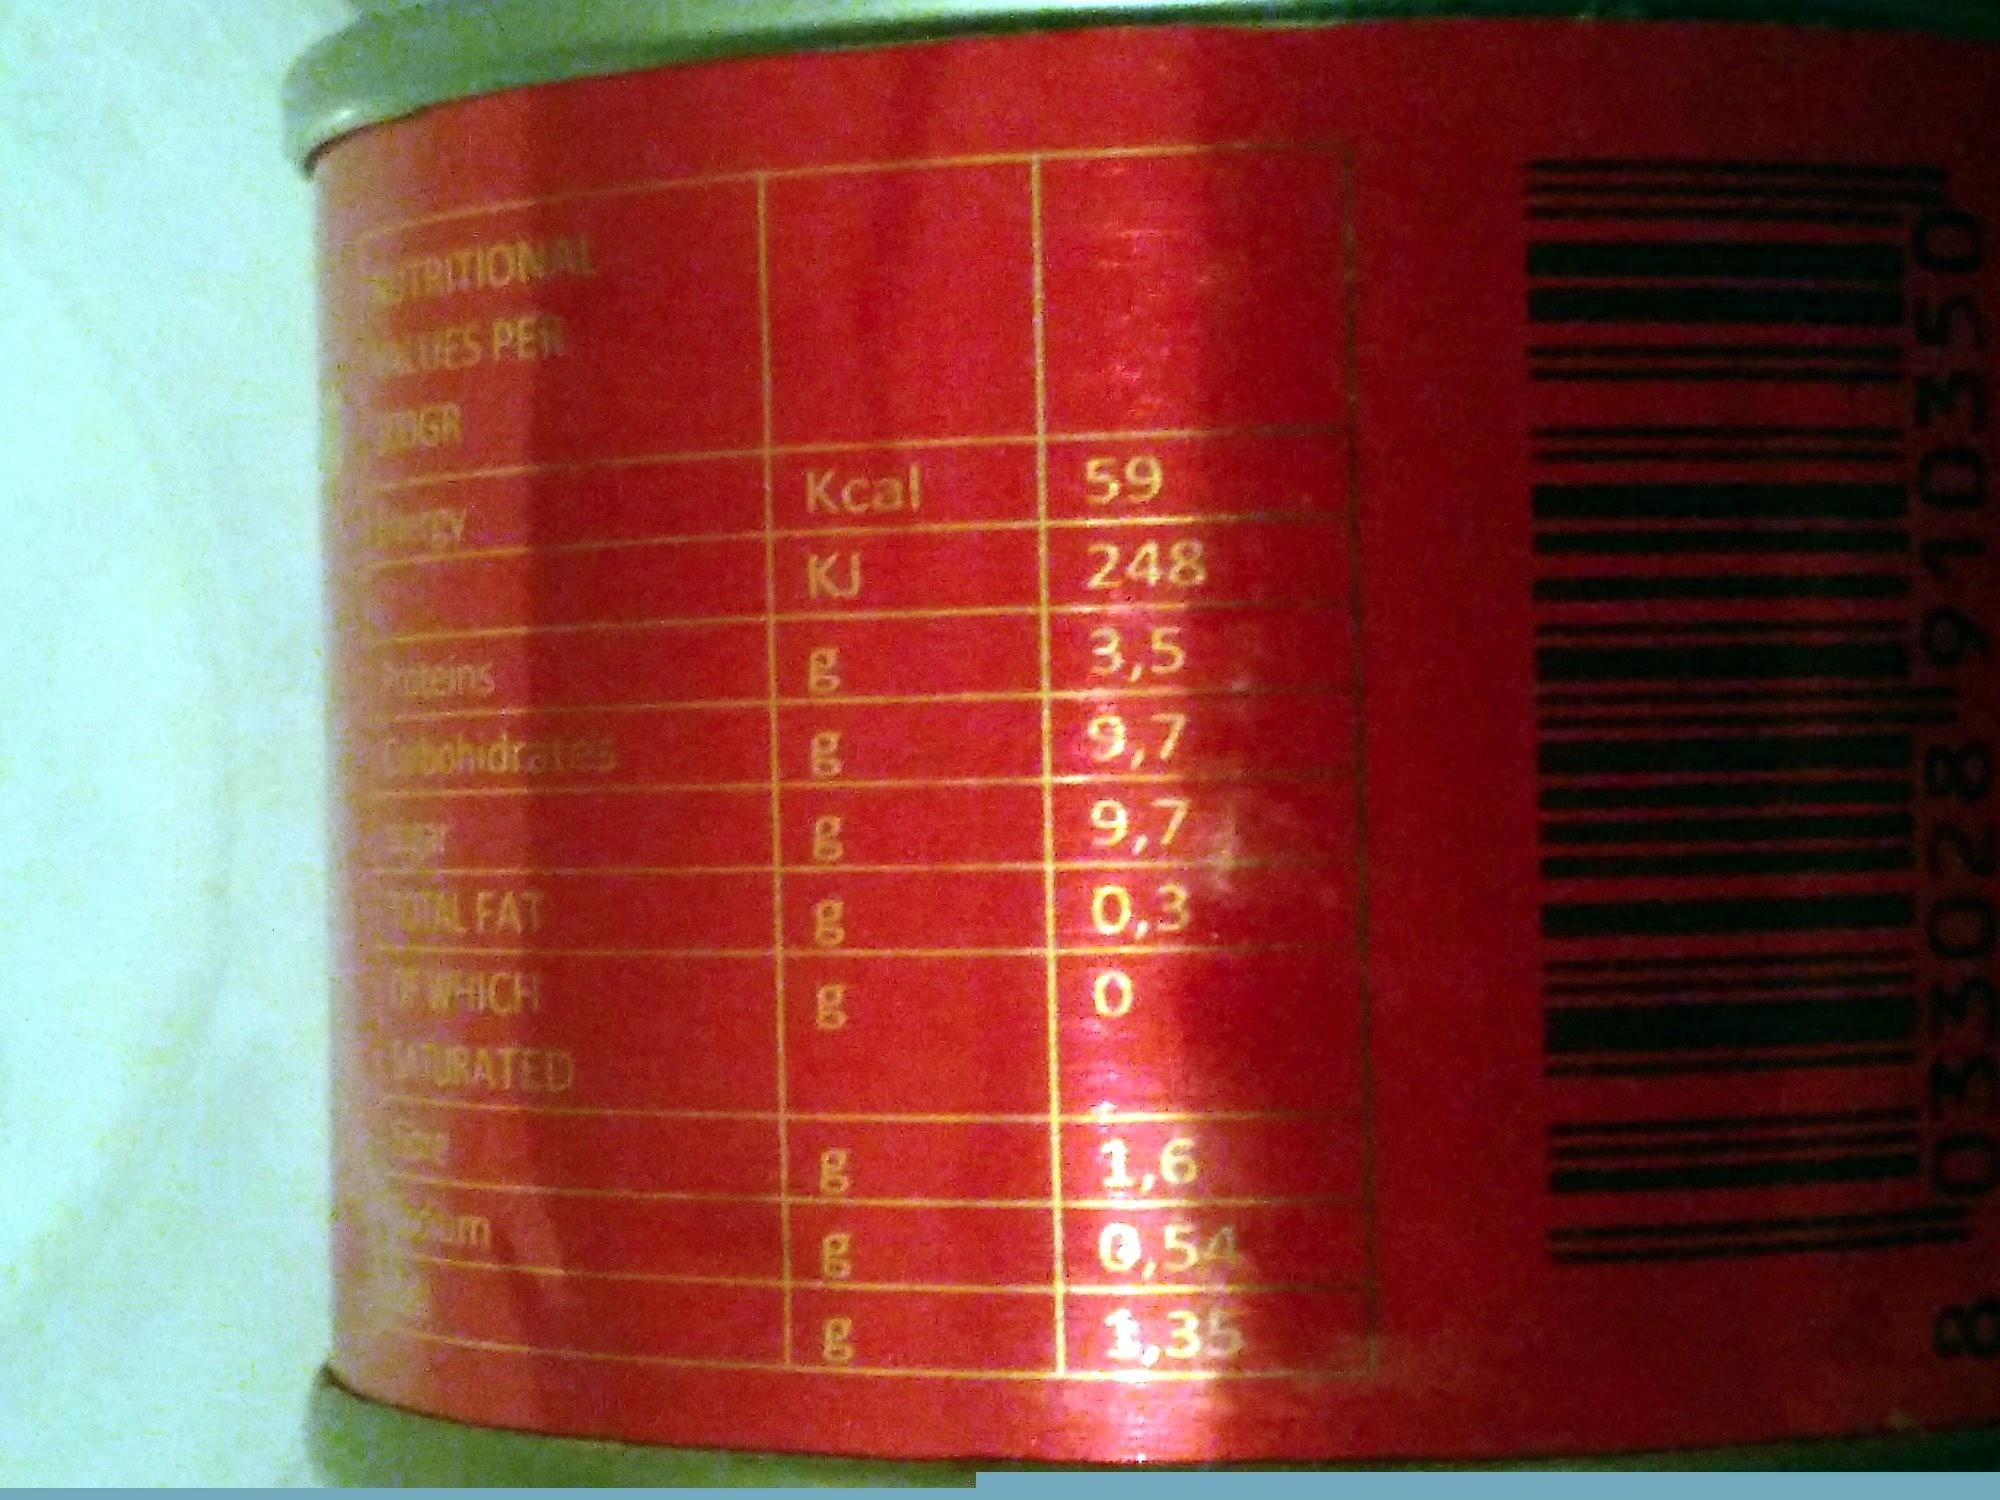 Nova tomato paste - Nutrition facts